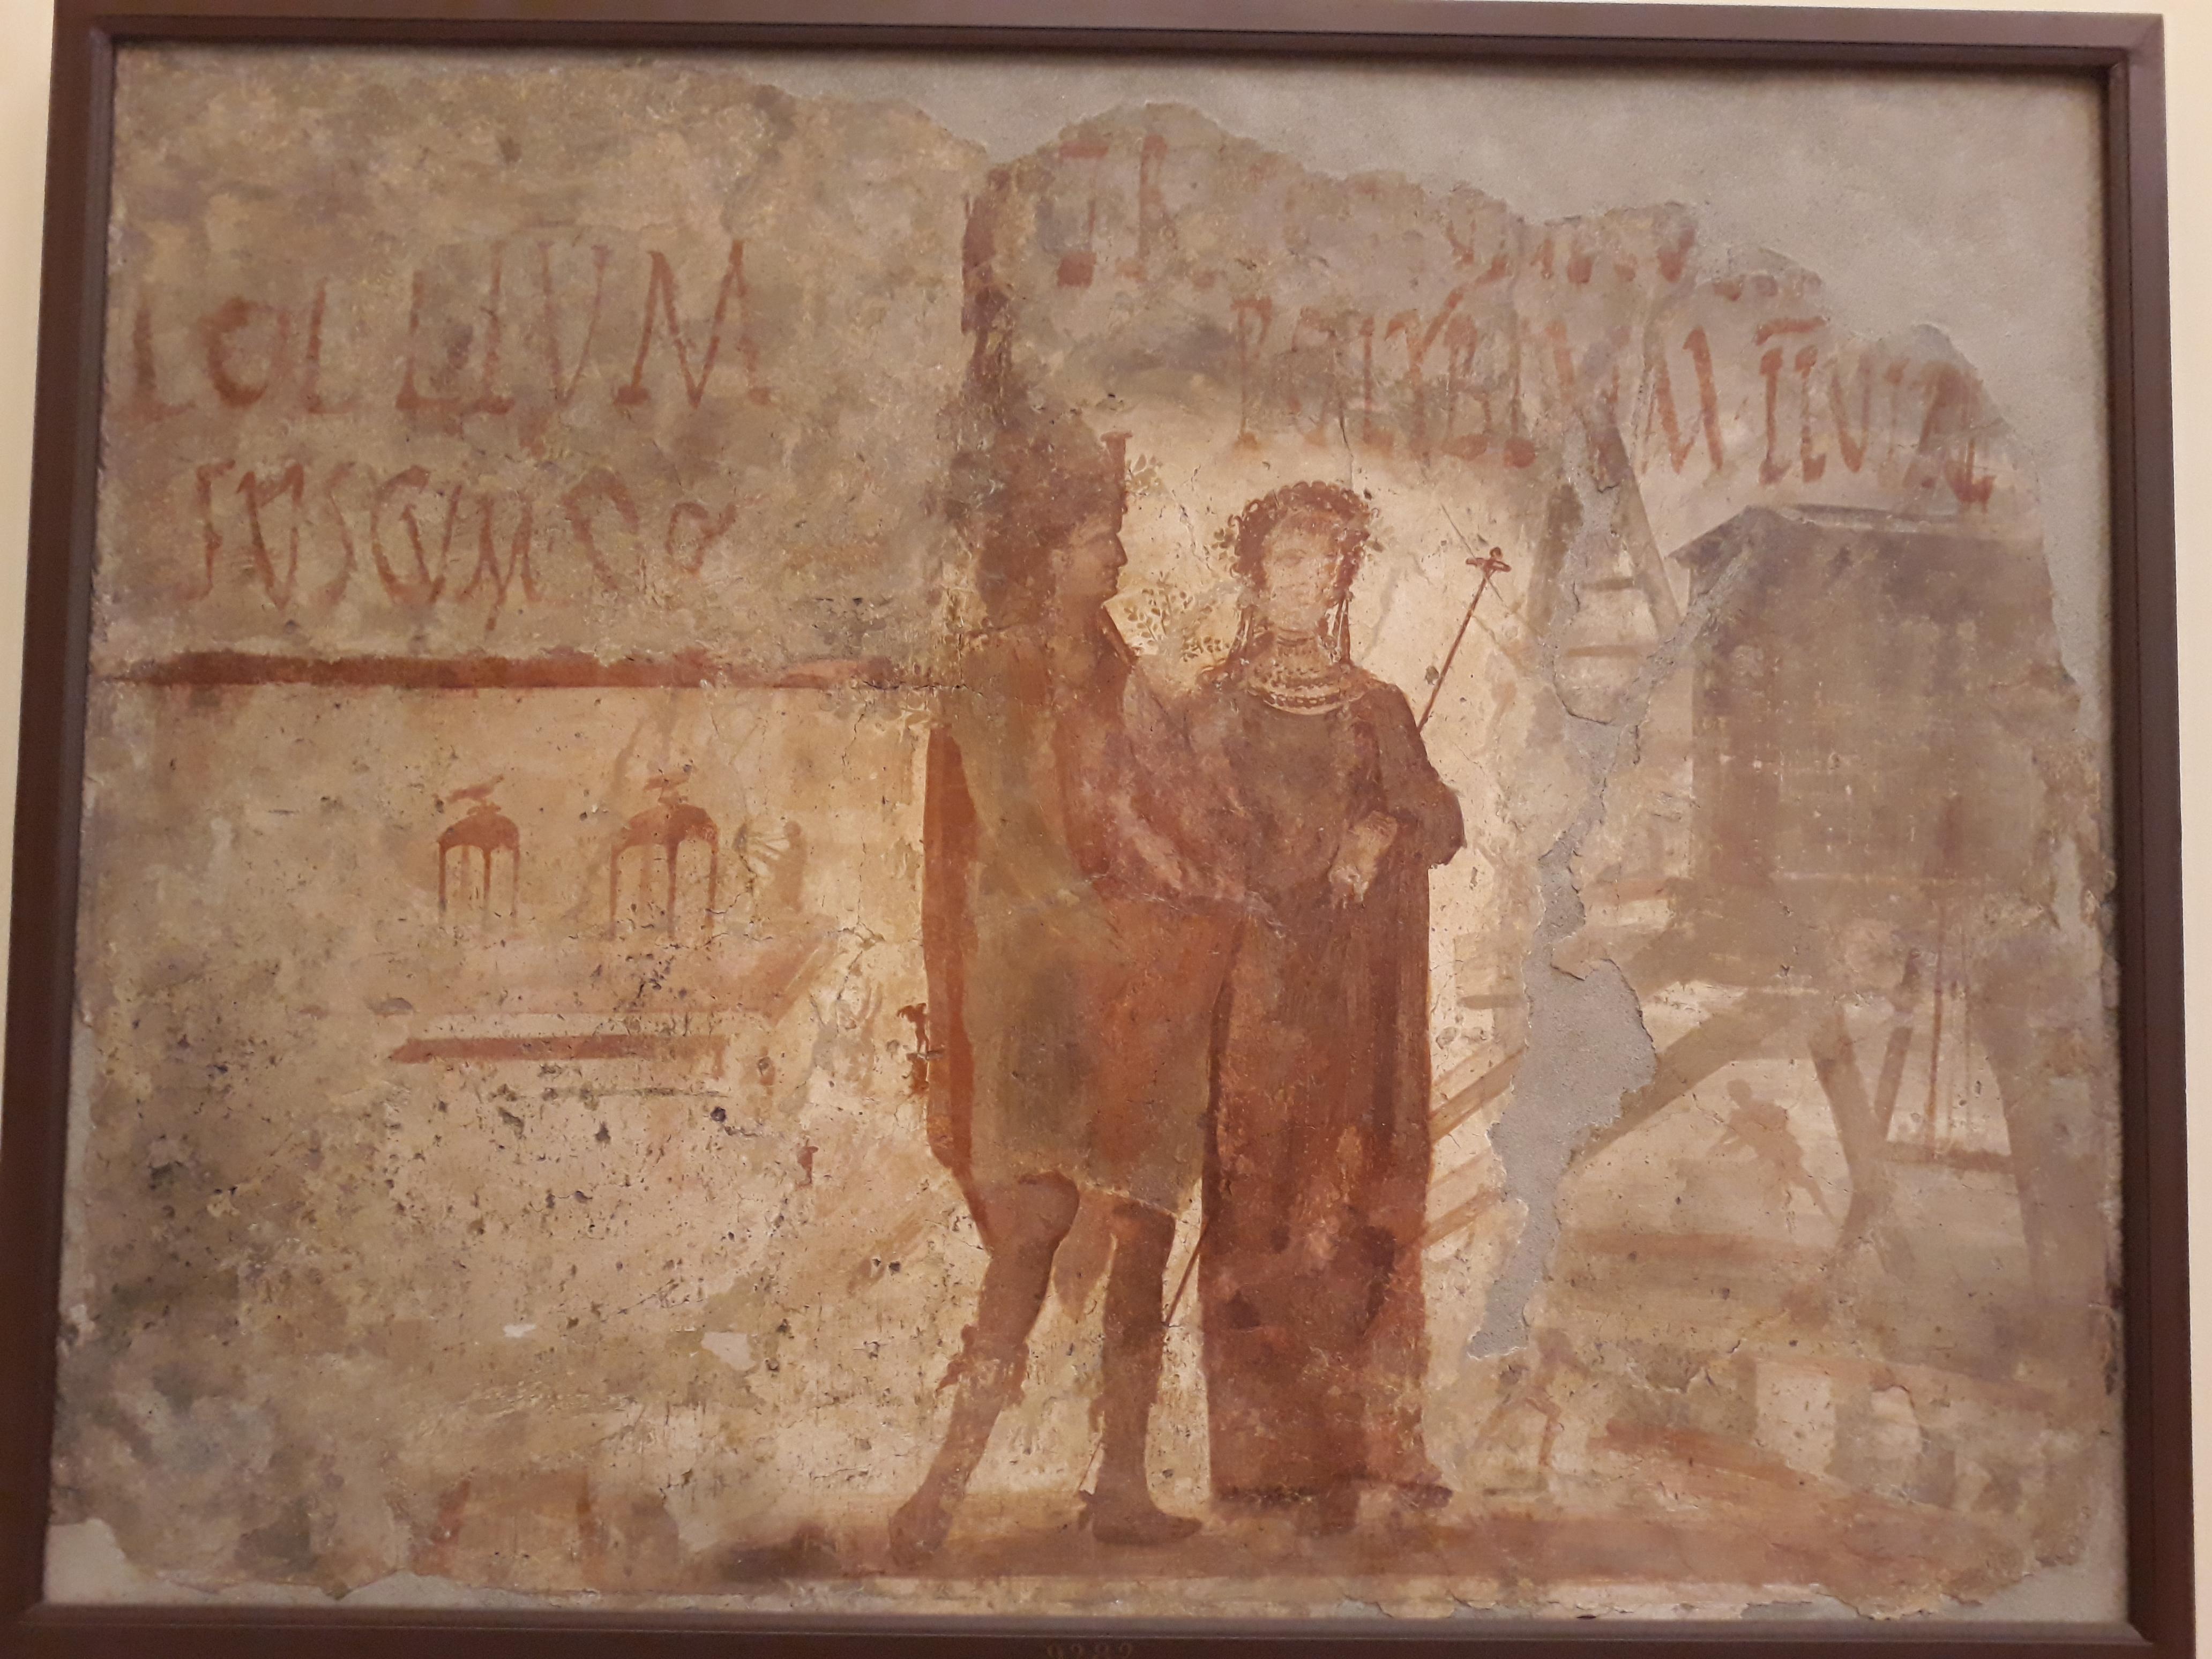 https://upload.wikimedia.org/wikipedia/commons/0/0c/Museo_Archeologico_Nazionale_di_Napoli_67.jpg